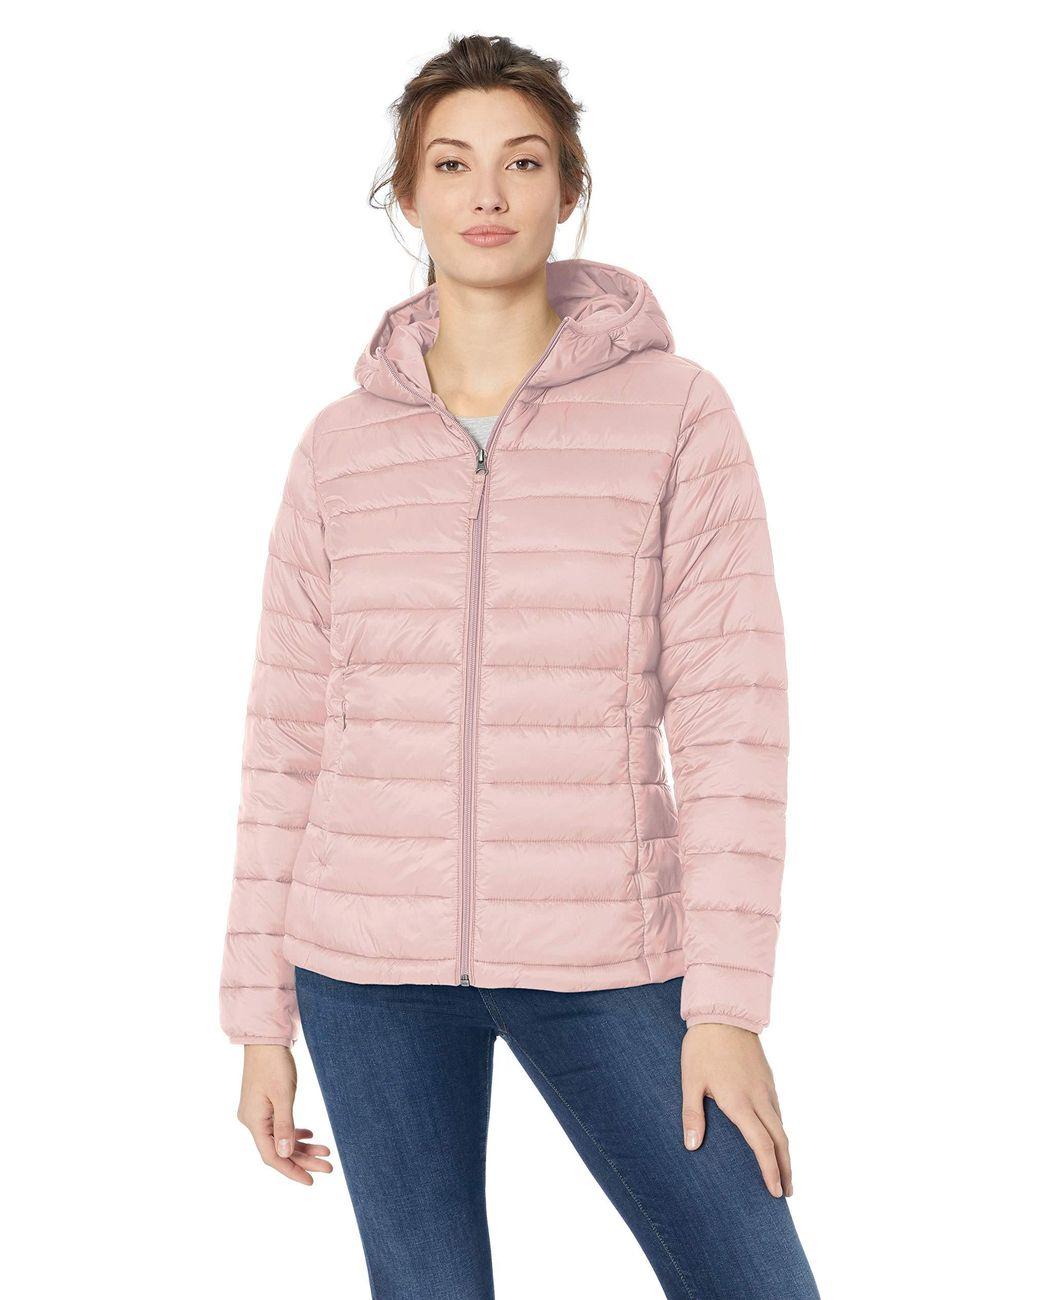 Essentials girls Water-Resistant Packable Hooded Puffer Jacket